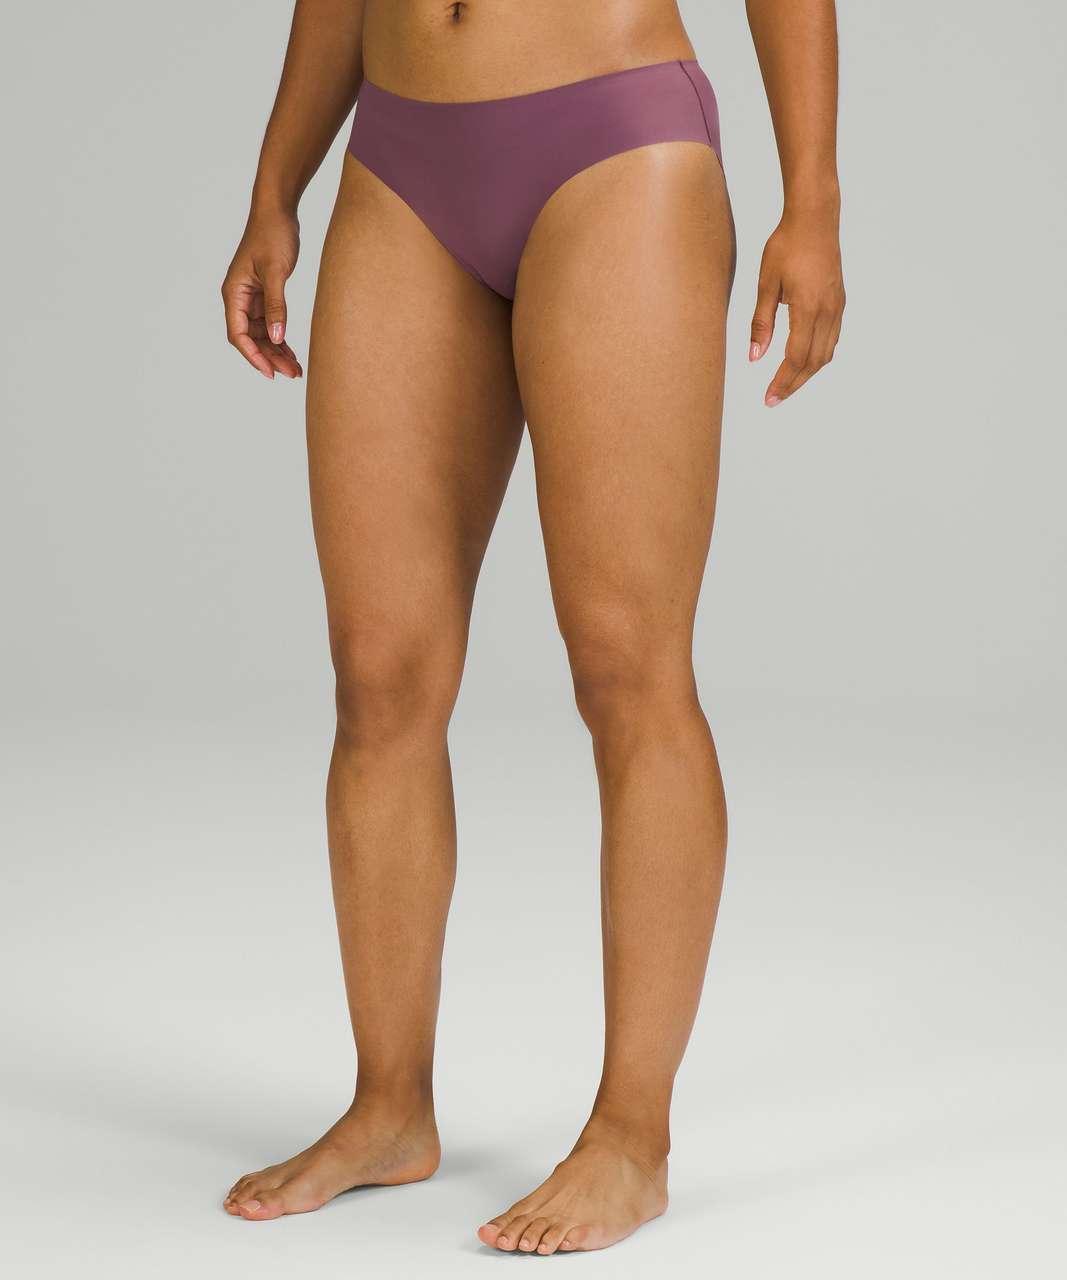 Lululemon InvisiWear Mid-Rise Bikini Underwear 3 Pack - Chrome / Brick Purple / Dew Green